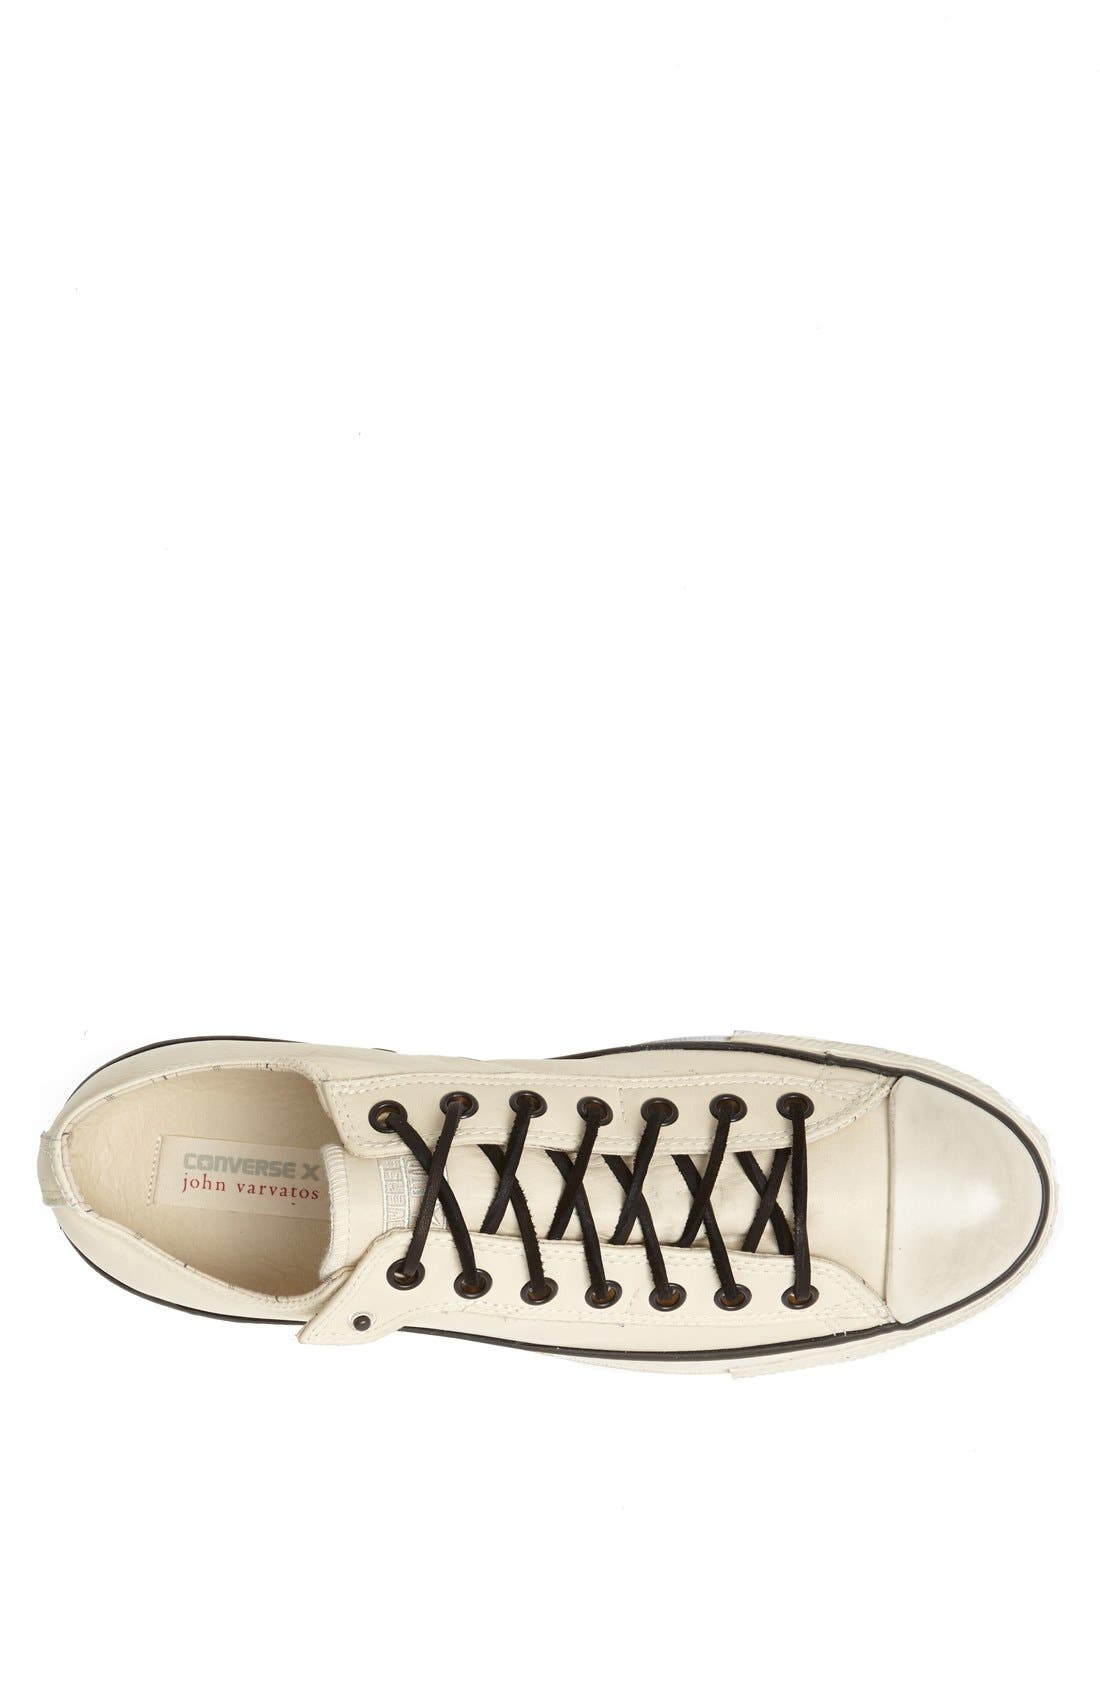 Alternate Image 3  - Converse by John Varvatos Chuck Taylor® All Star® Sneaker